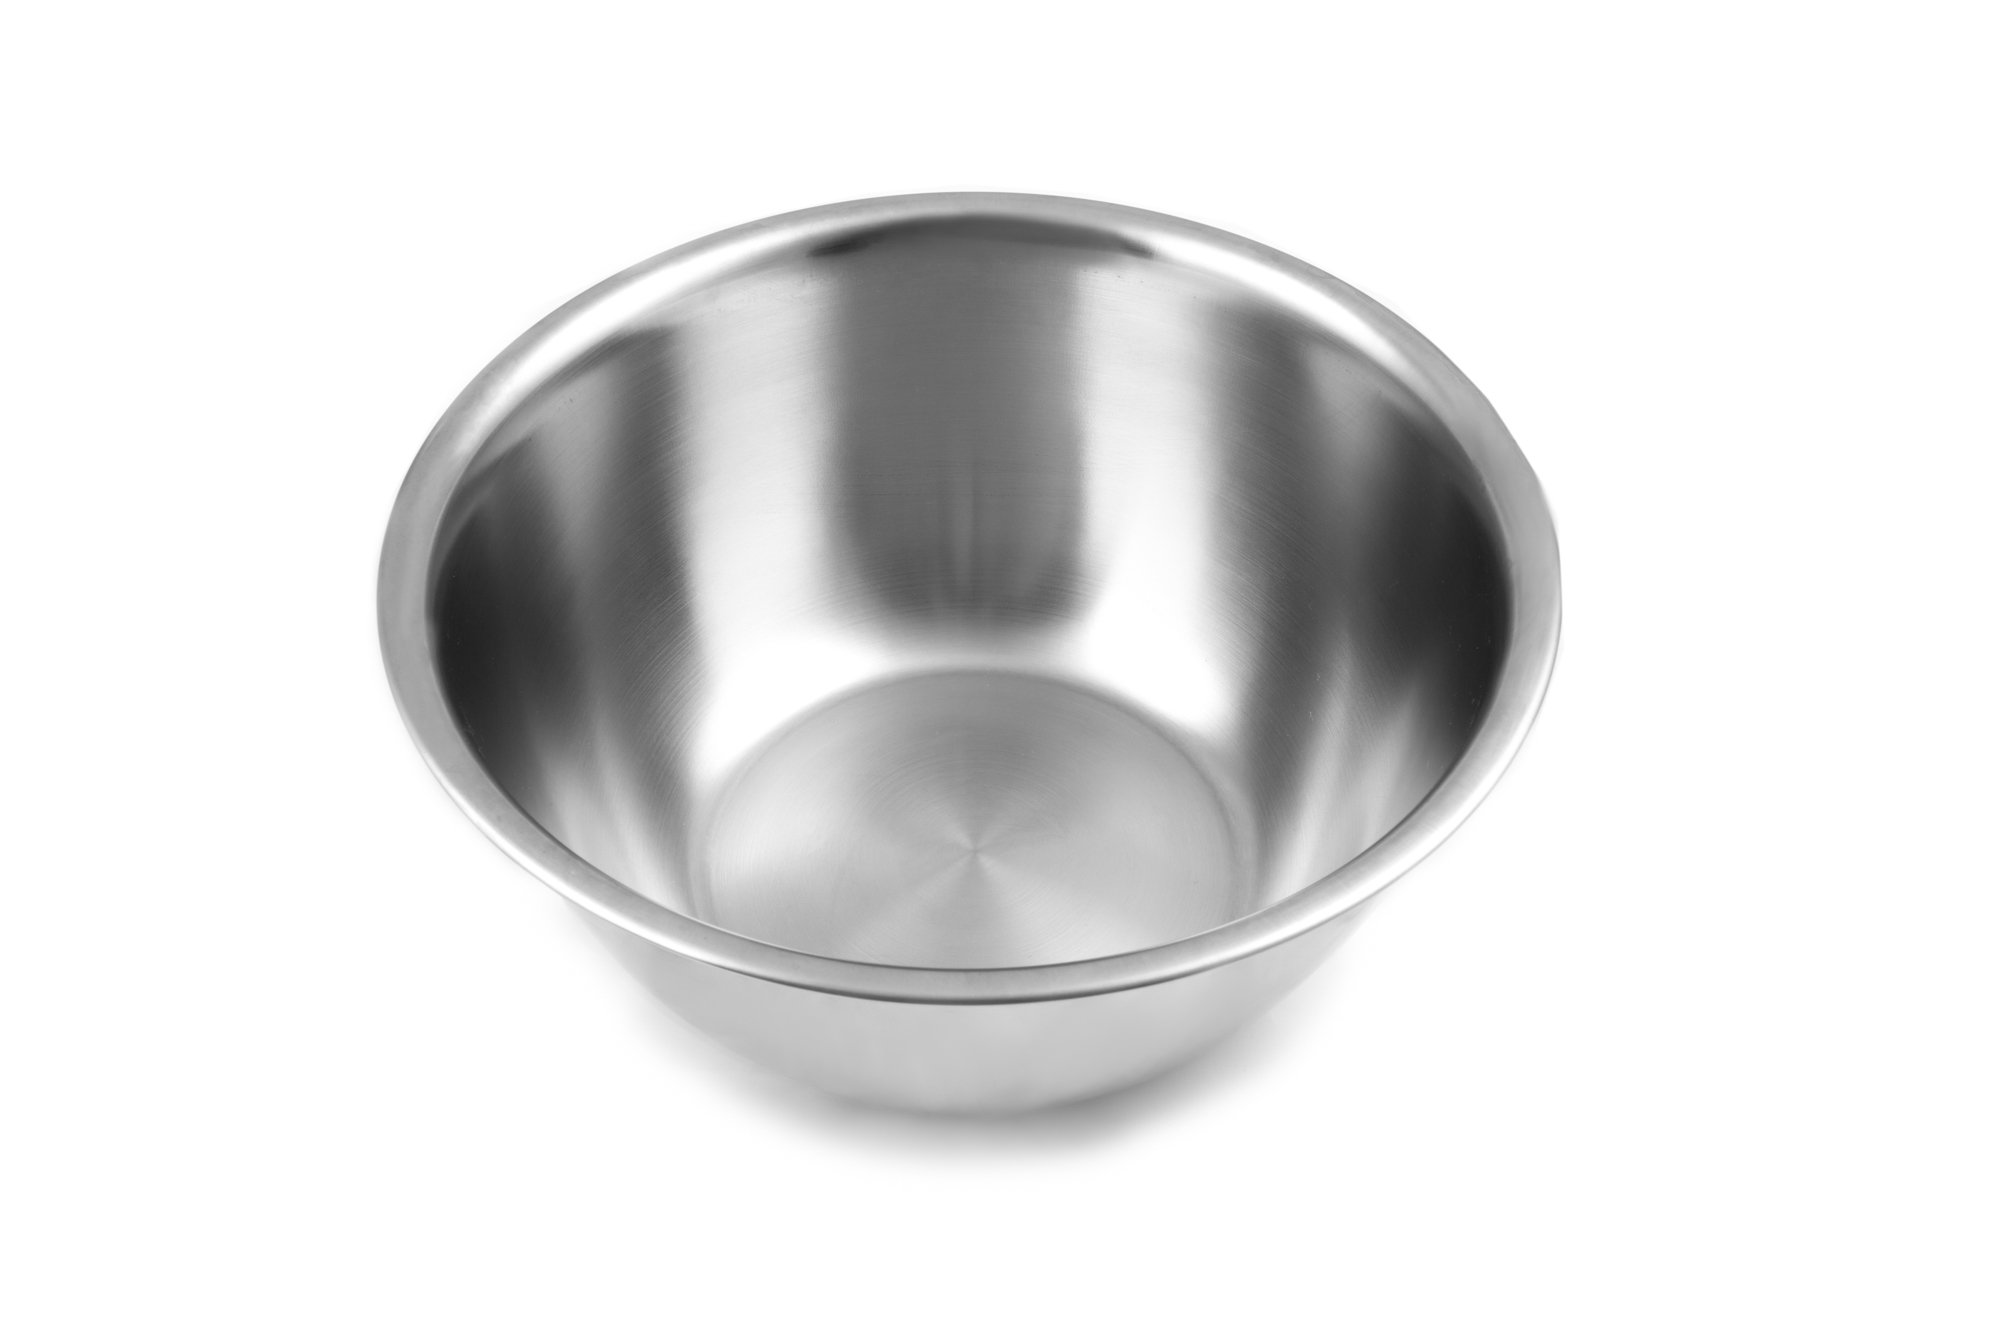 Fox Run 5-Quart Stainless Steel Mixing Bowl by Fox Run (Image #5)